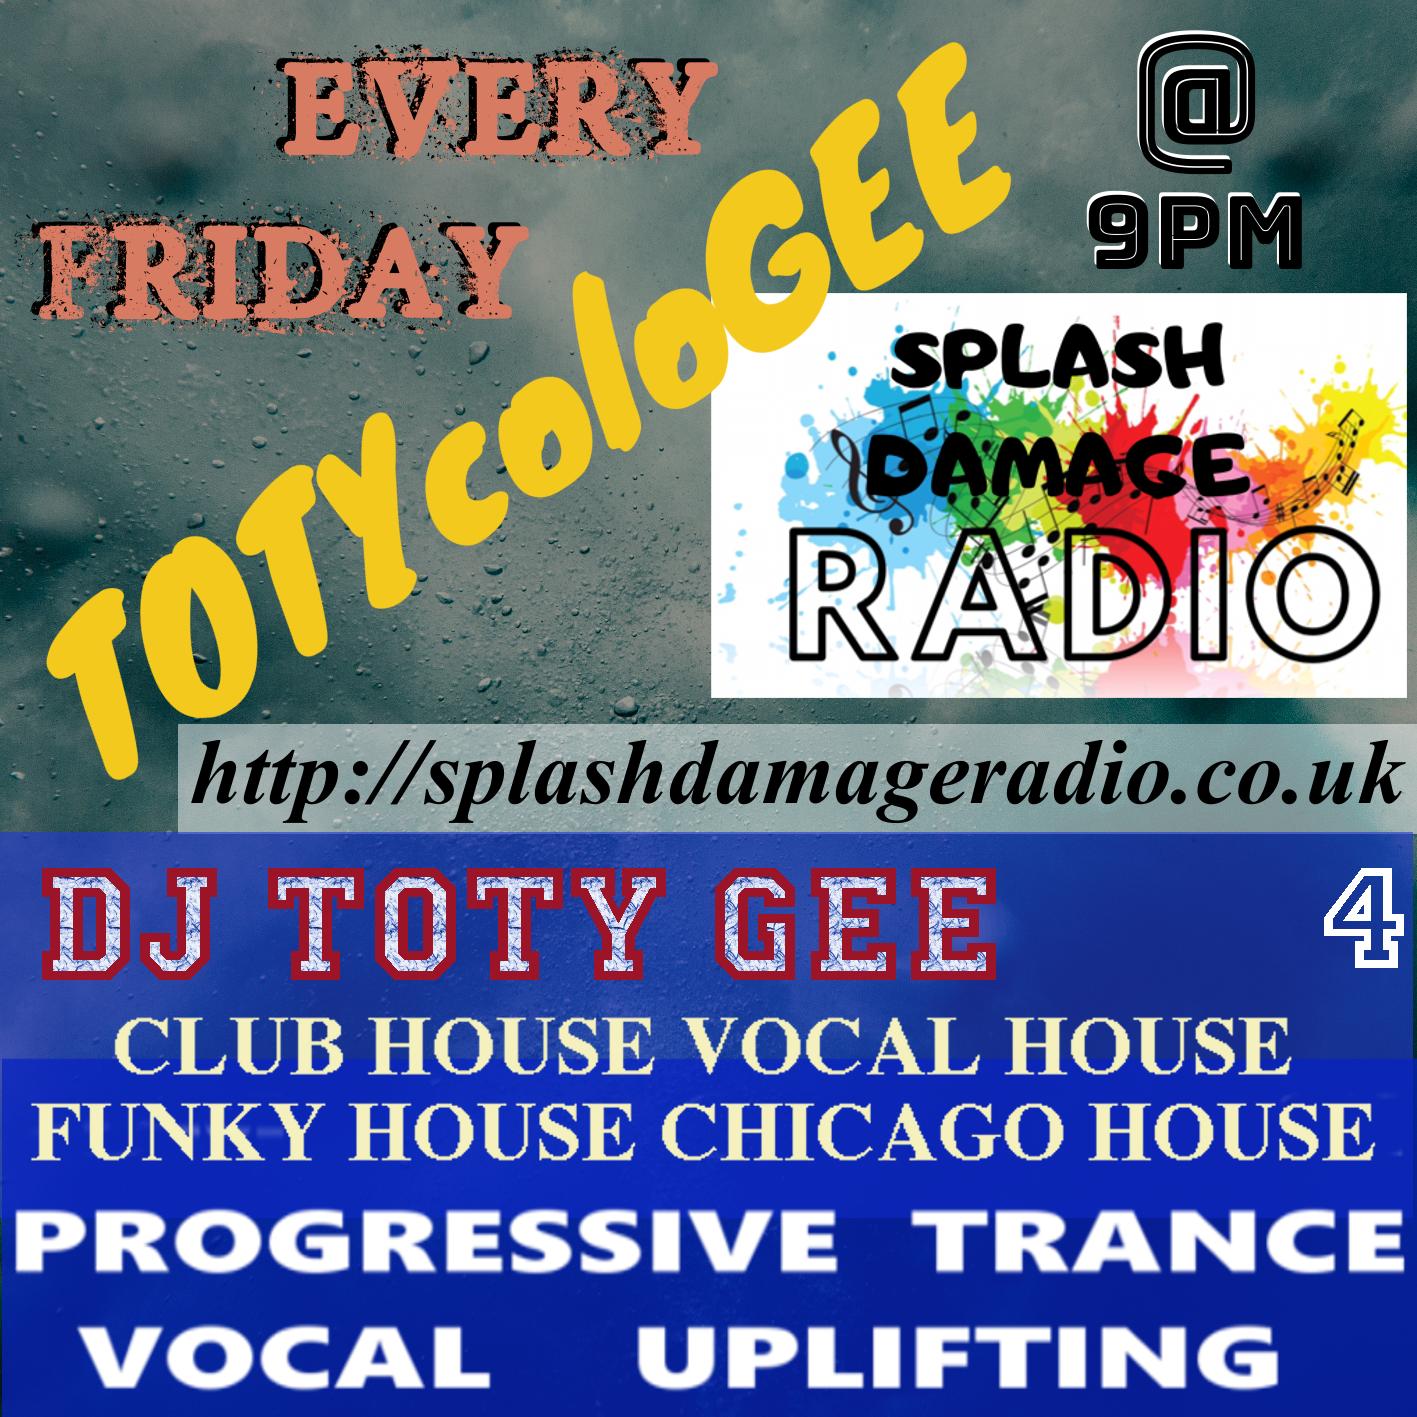 TOTYcoloGEE on SplashDamageRadio ep. 05